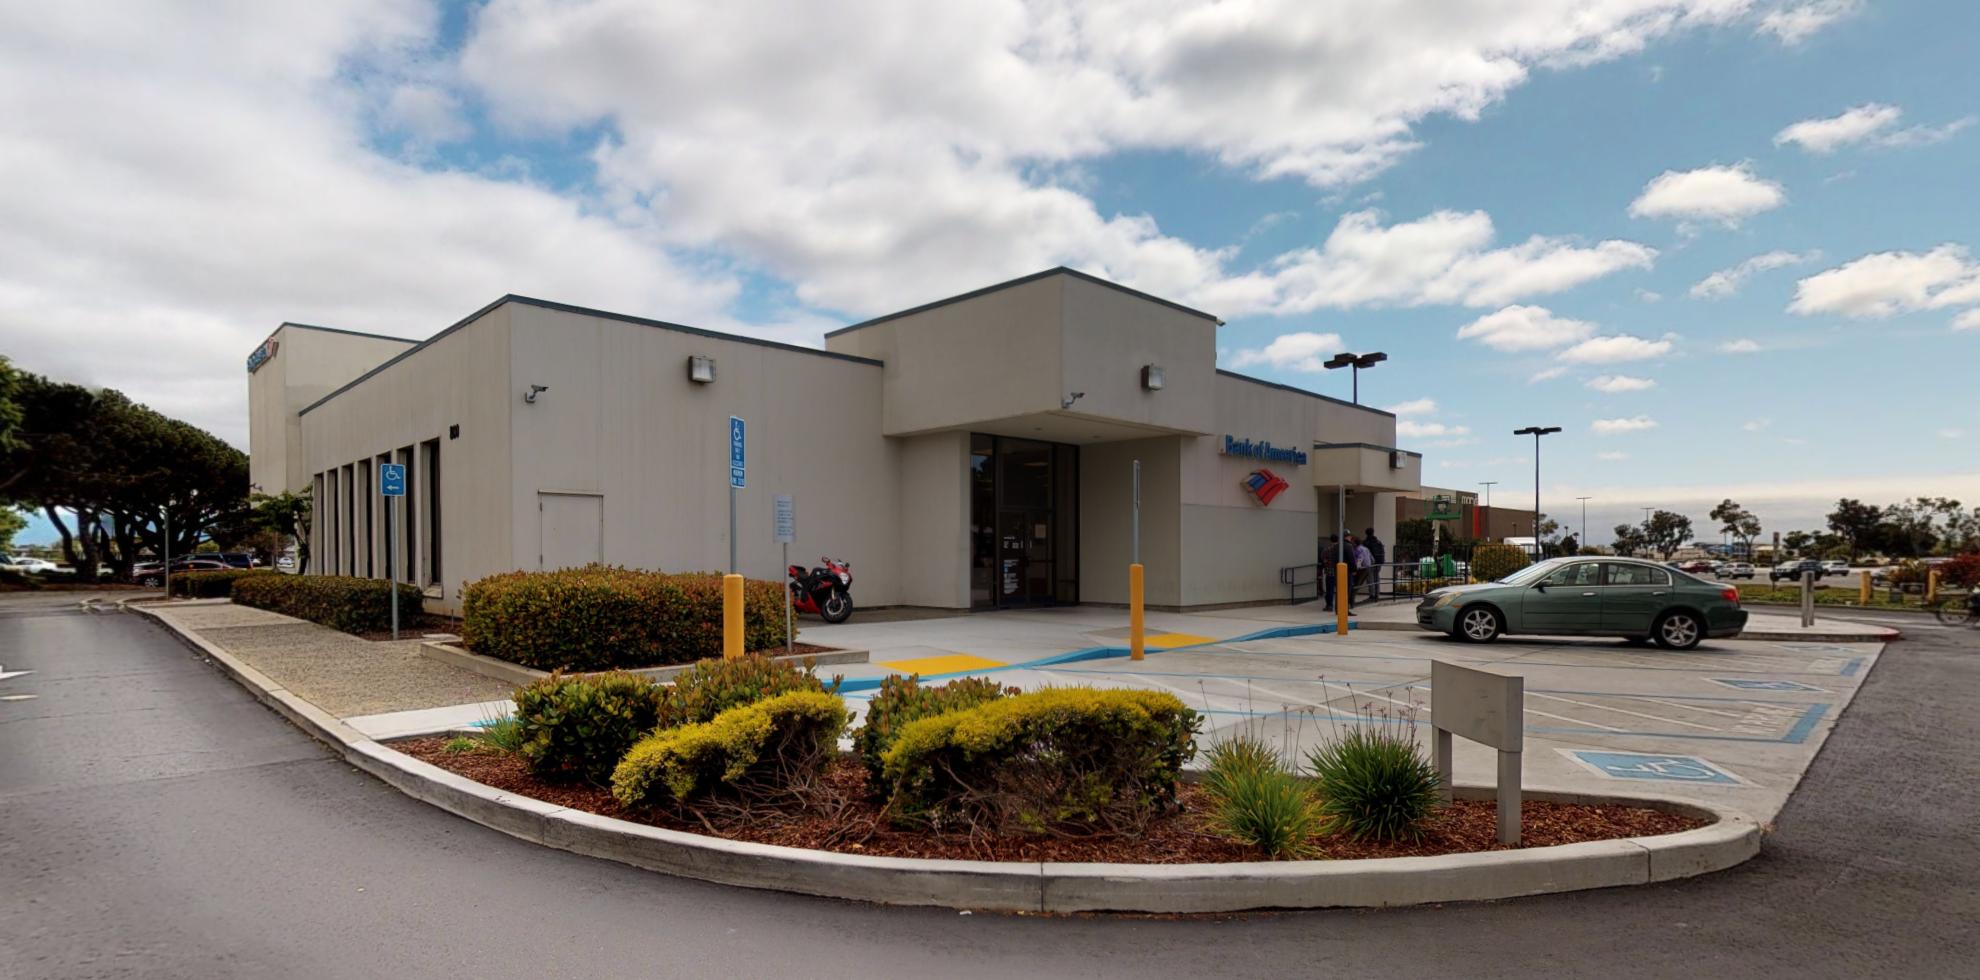 Bank of America financial center with drive-thru ATM | 800 Northridge Shopping Ctr, Salinas, CA 93906